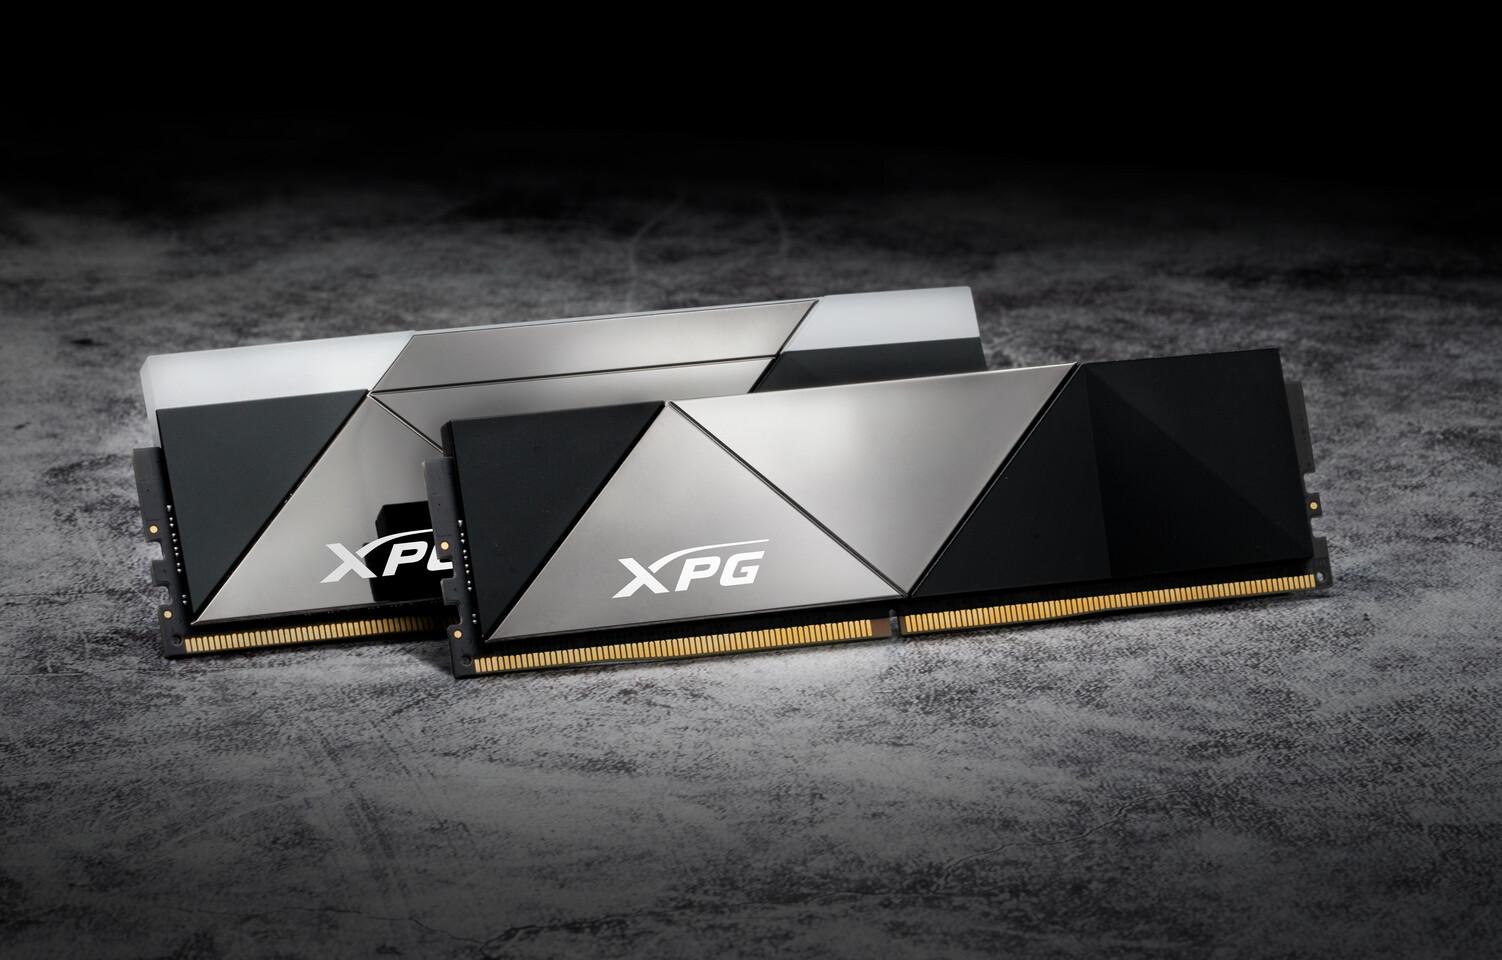 ADATA XPG CASTER DDR5 7400